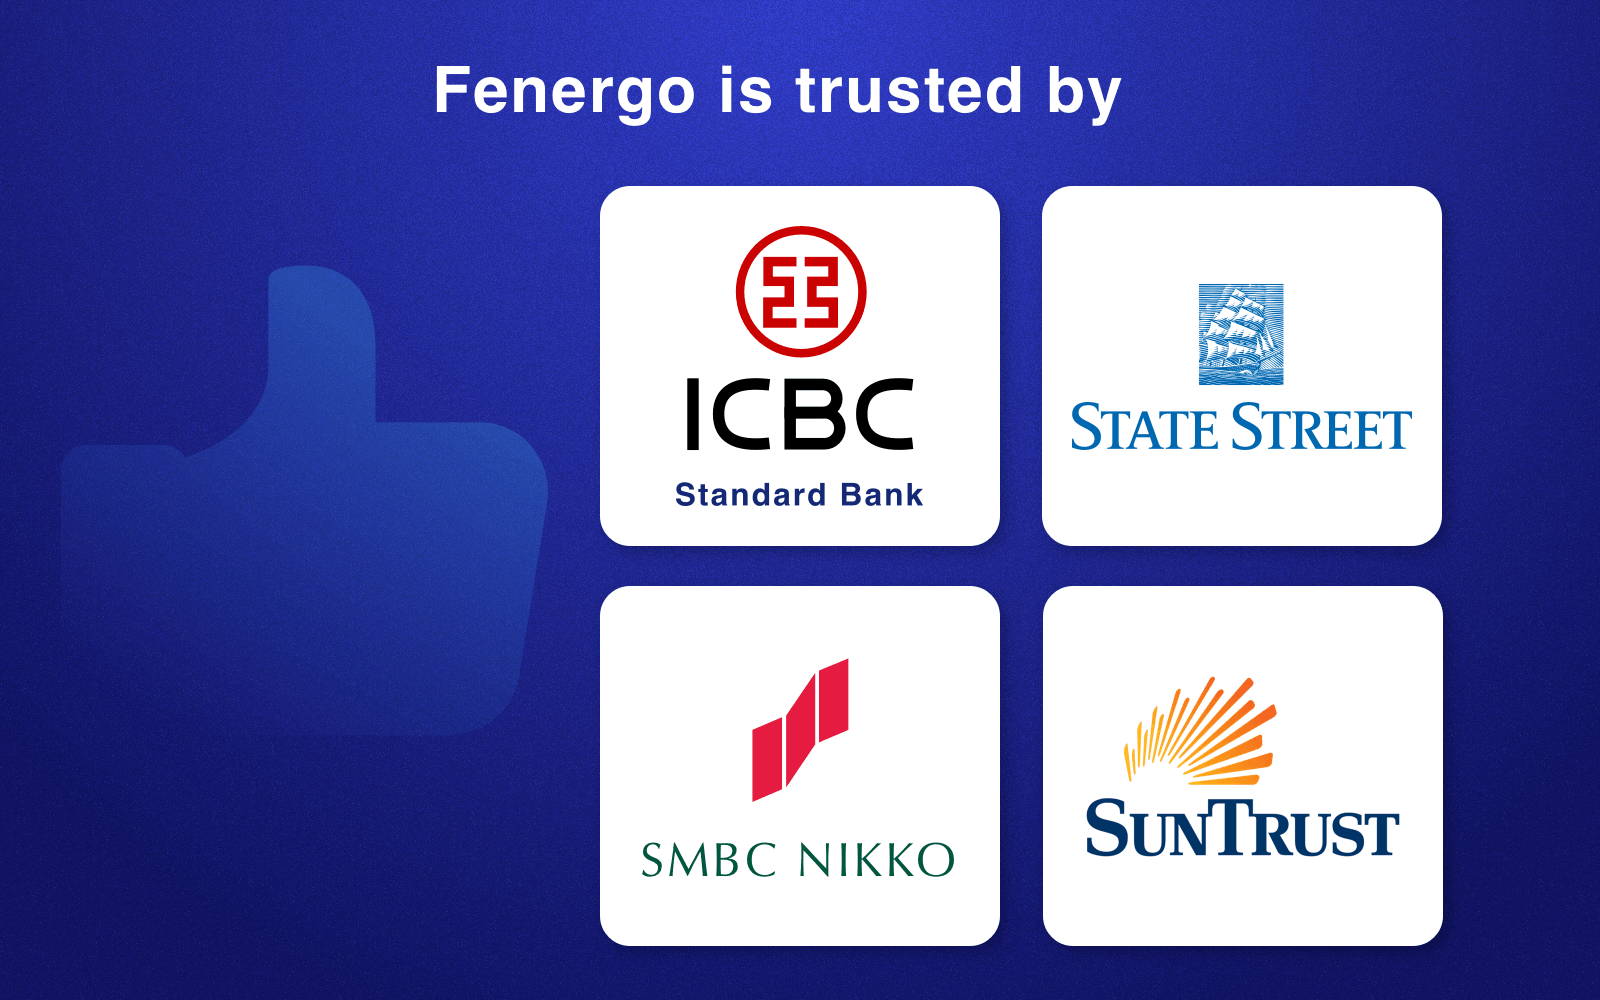 RegTech solutions: Fenegro